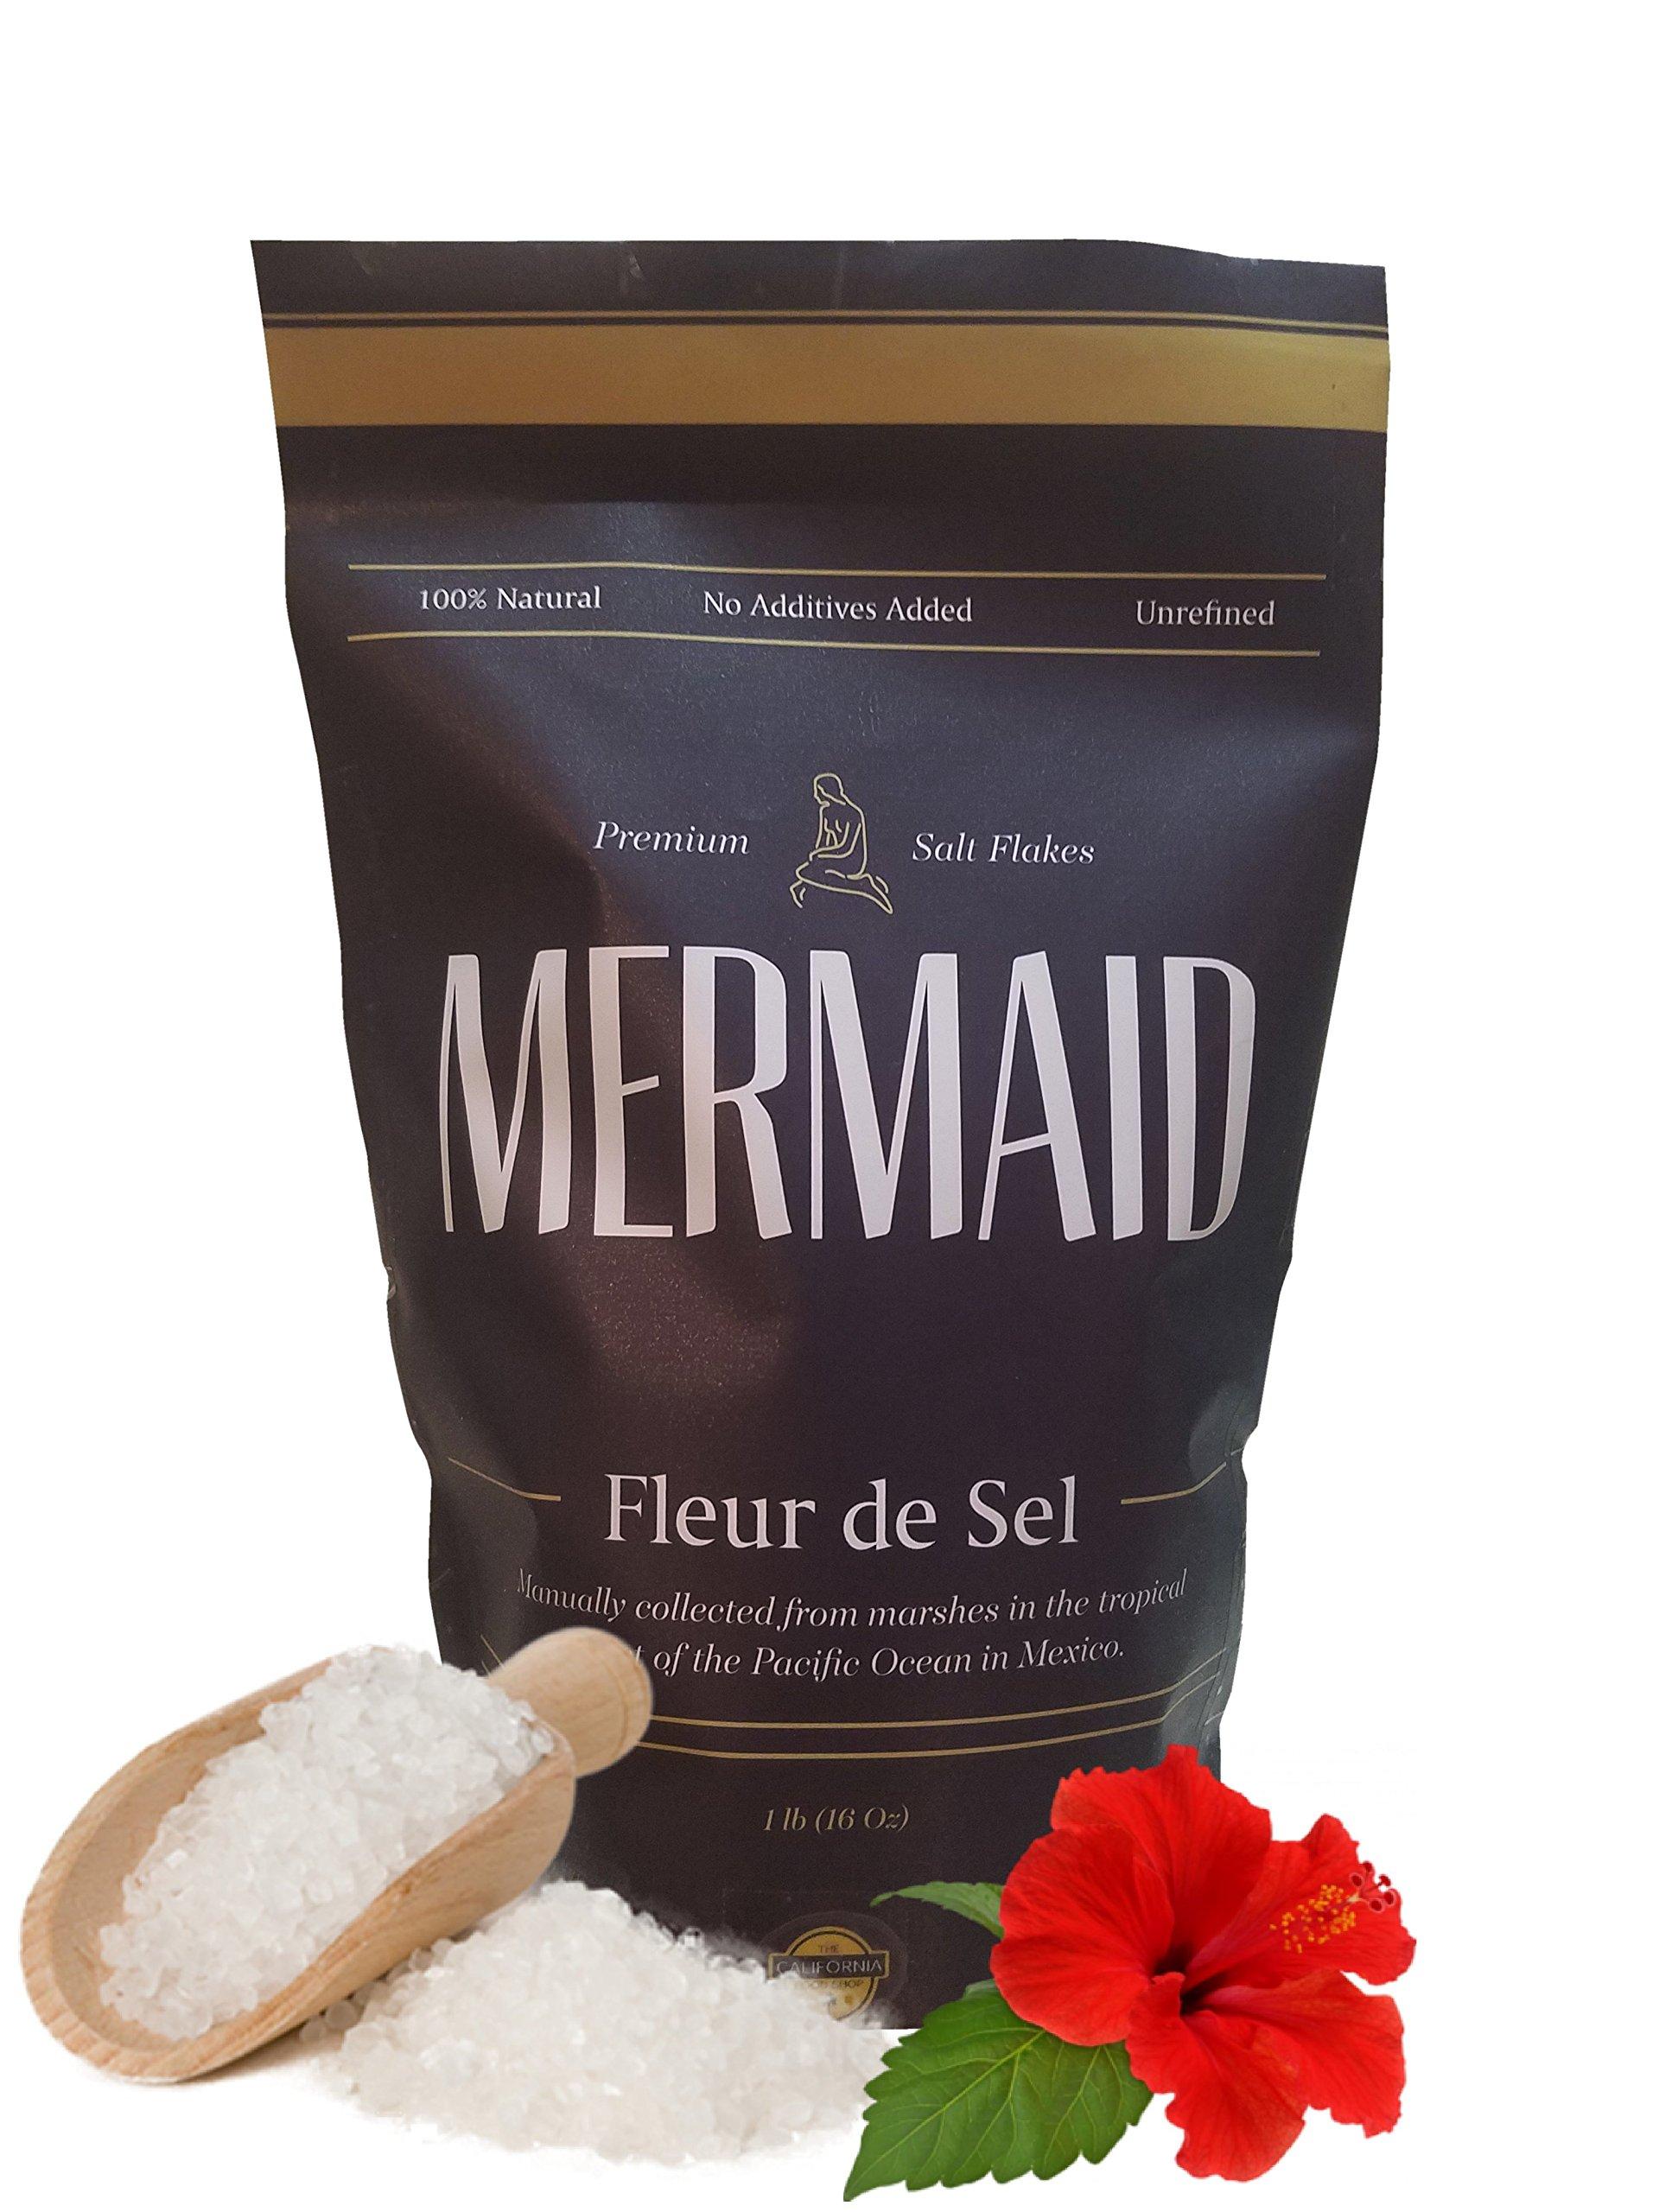 1 pound Mermaid Fleur de Sel – Pacific Ocean Salt Flower – Manually Collected In the Tropical Coast – Extra Flavorful – Unrefined Fleur de Sel – 100% Natural Sea Salt – 1lb Fleur de Sel